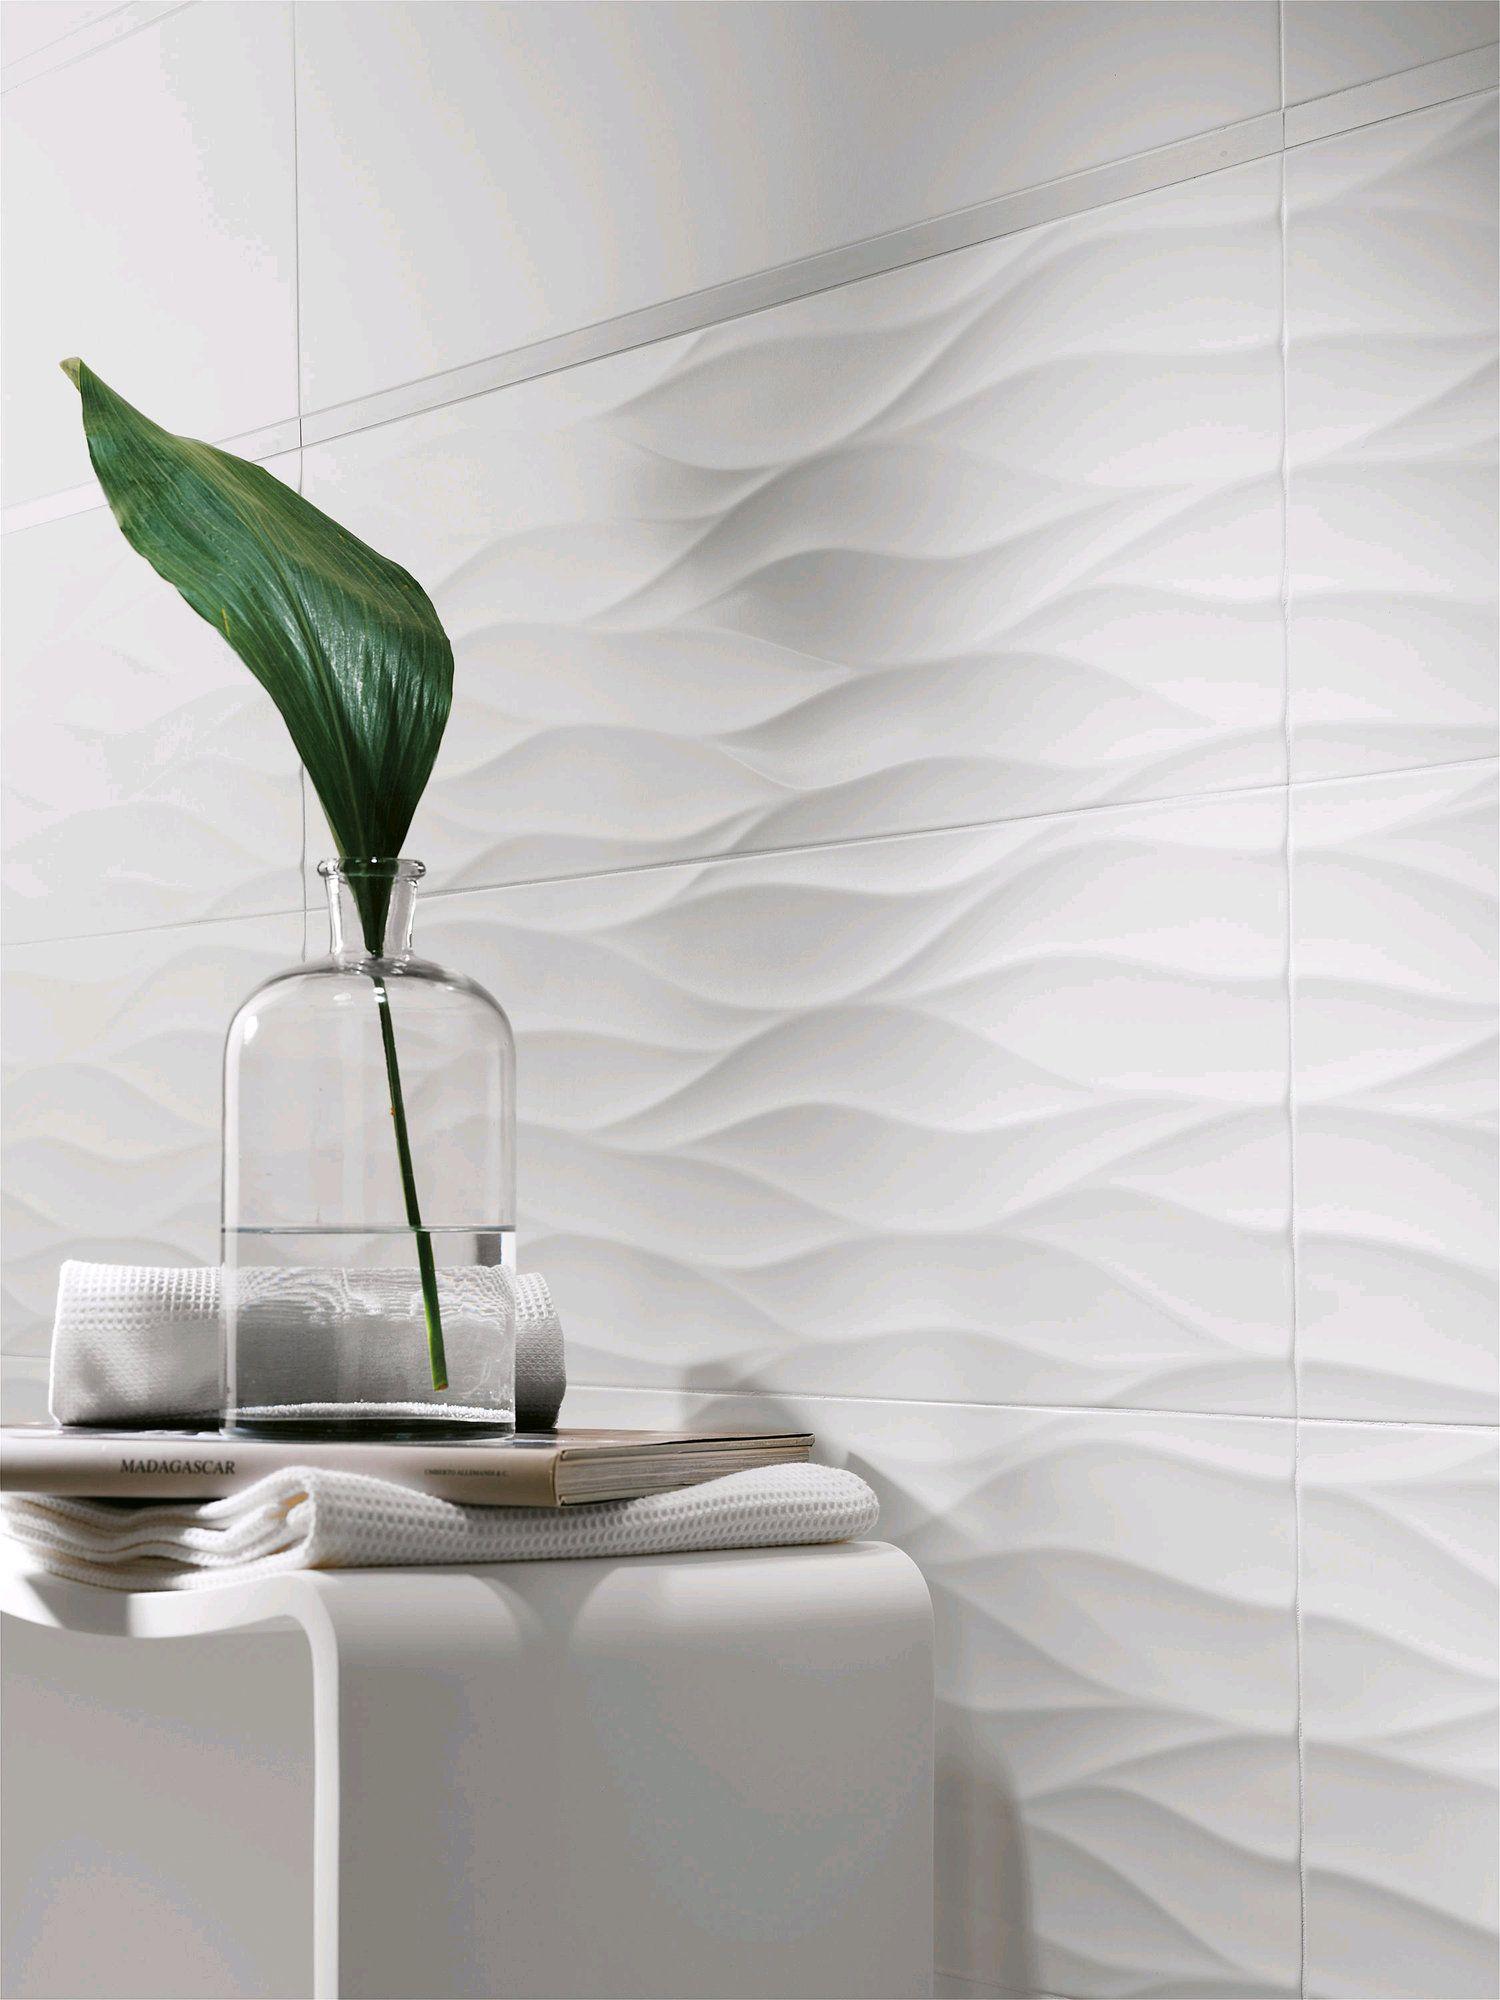 3d Textured Tiles White Wall Tiles Wall Tiles Living Room Bathroom Wall Tile